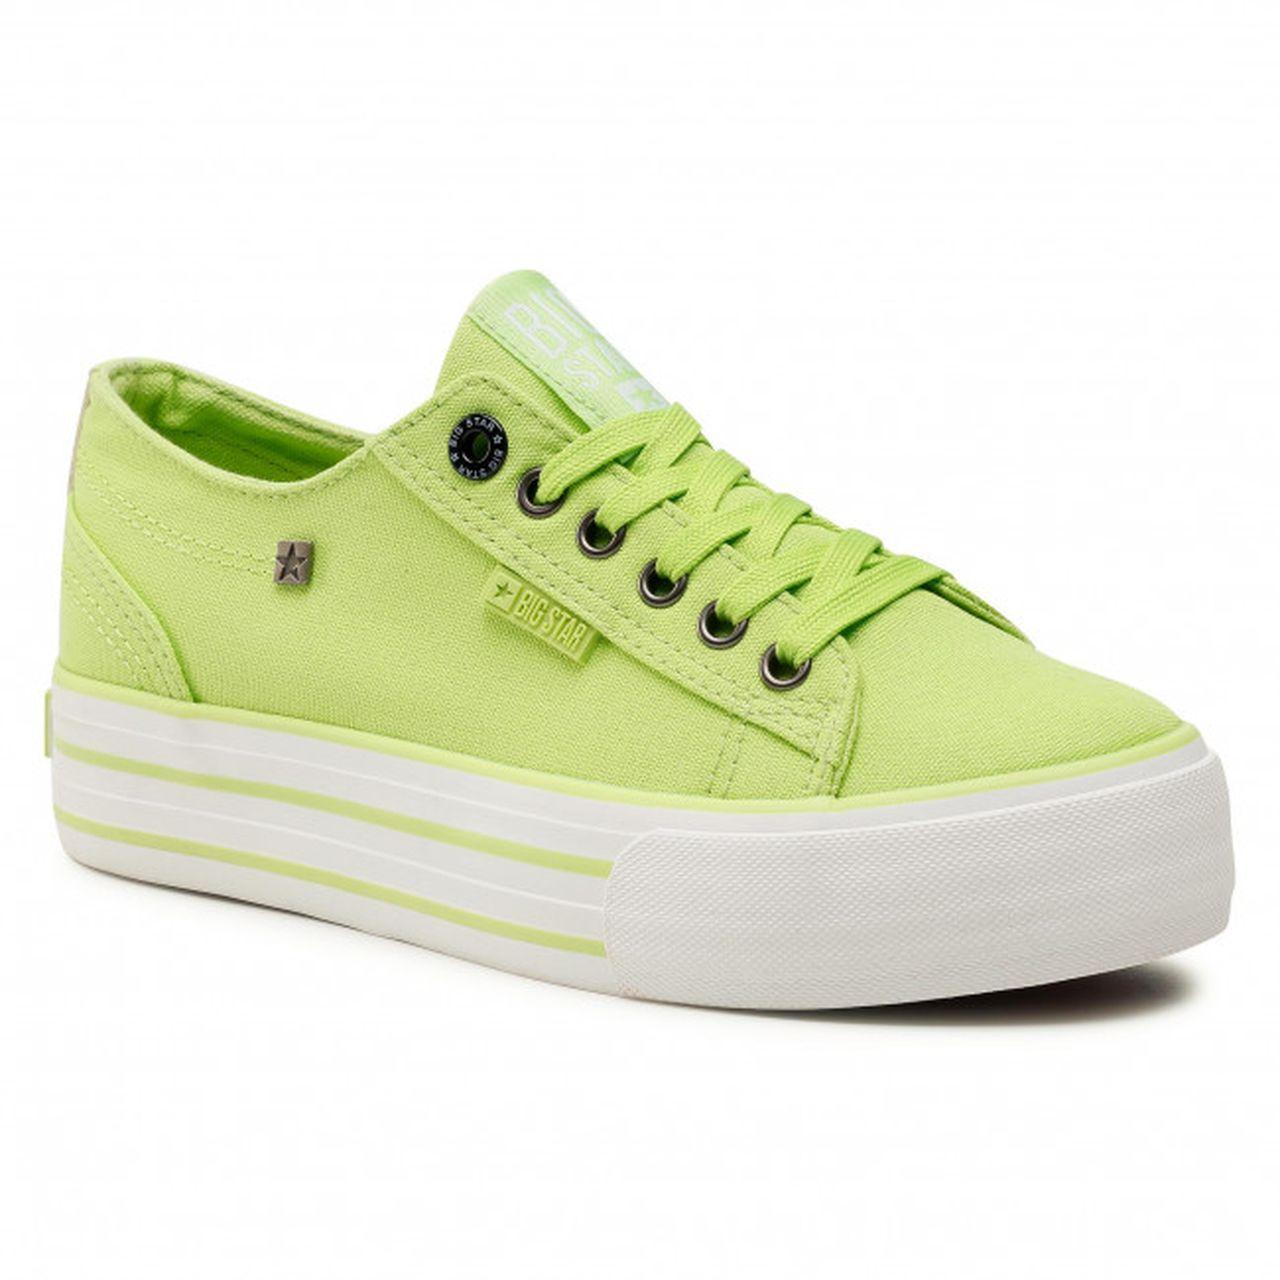 Zielone trampki